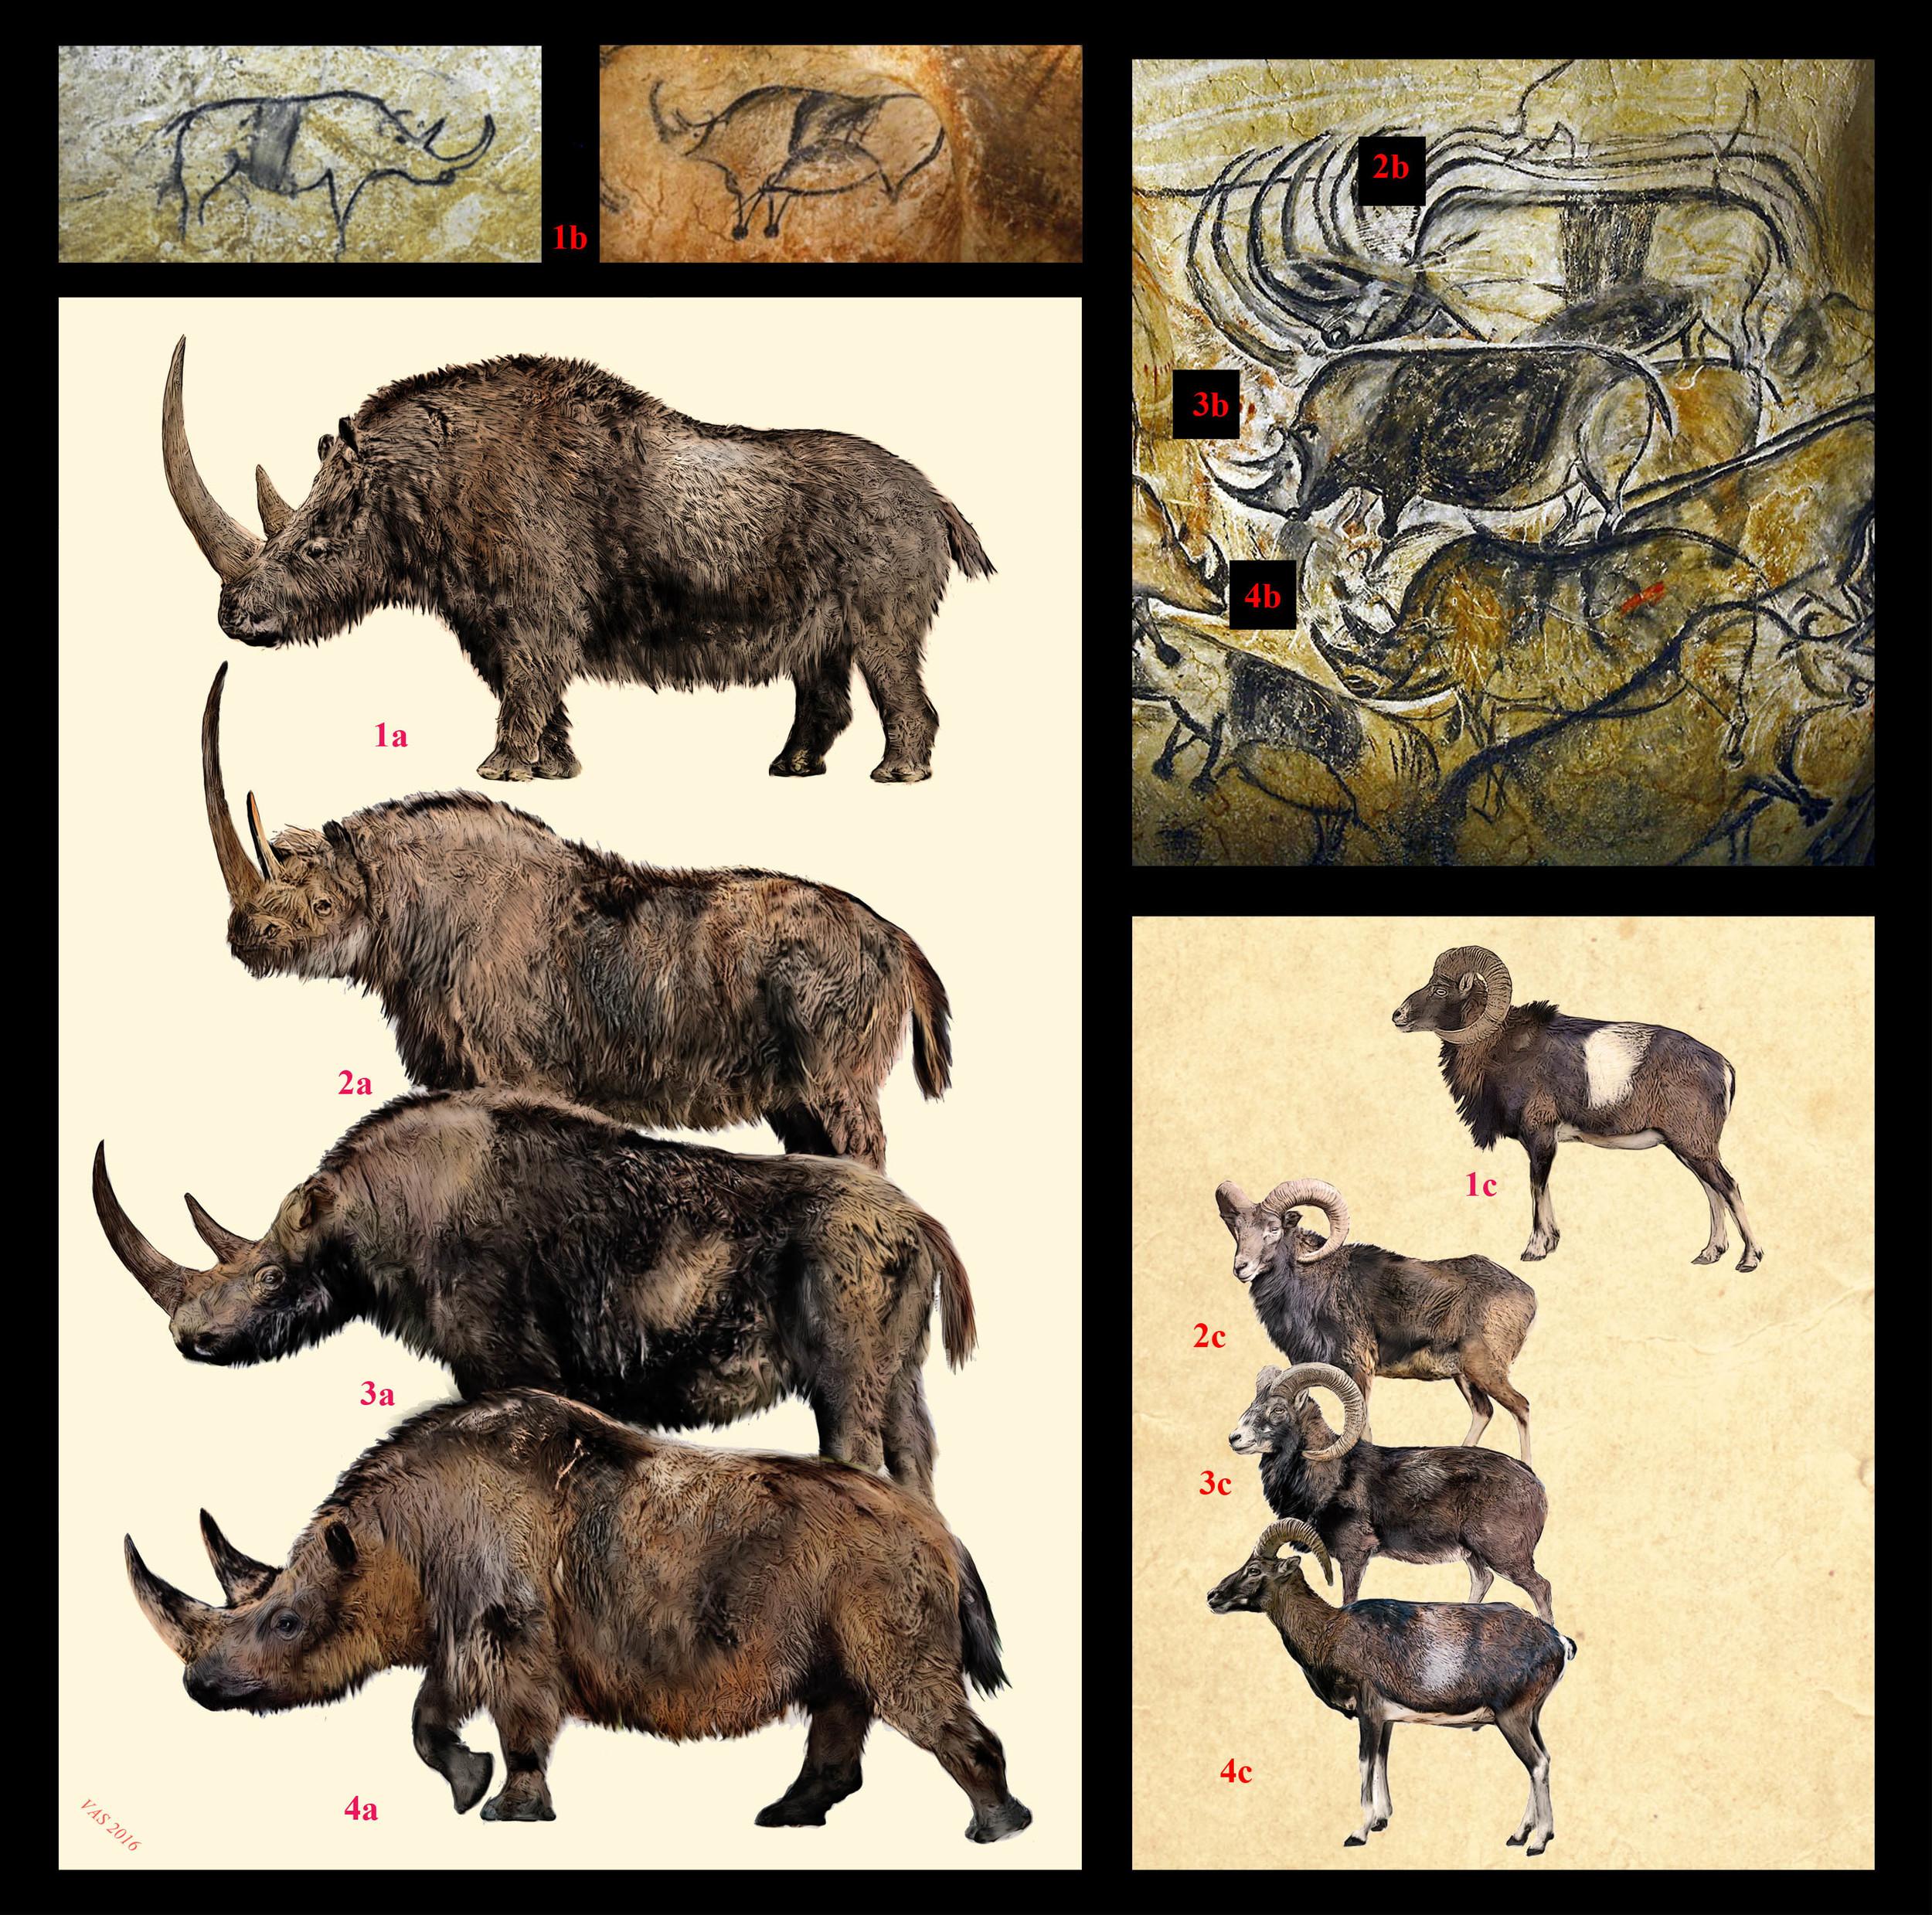 The Woolly Rhinos Of Chauvet The Wild Art Of Velizar Simeonovski